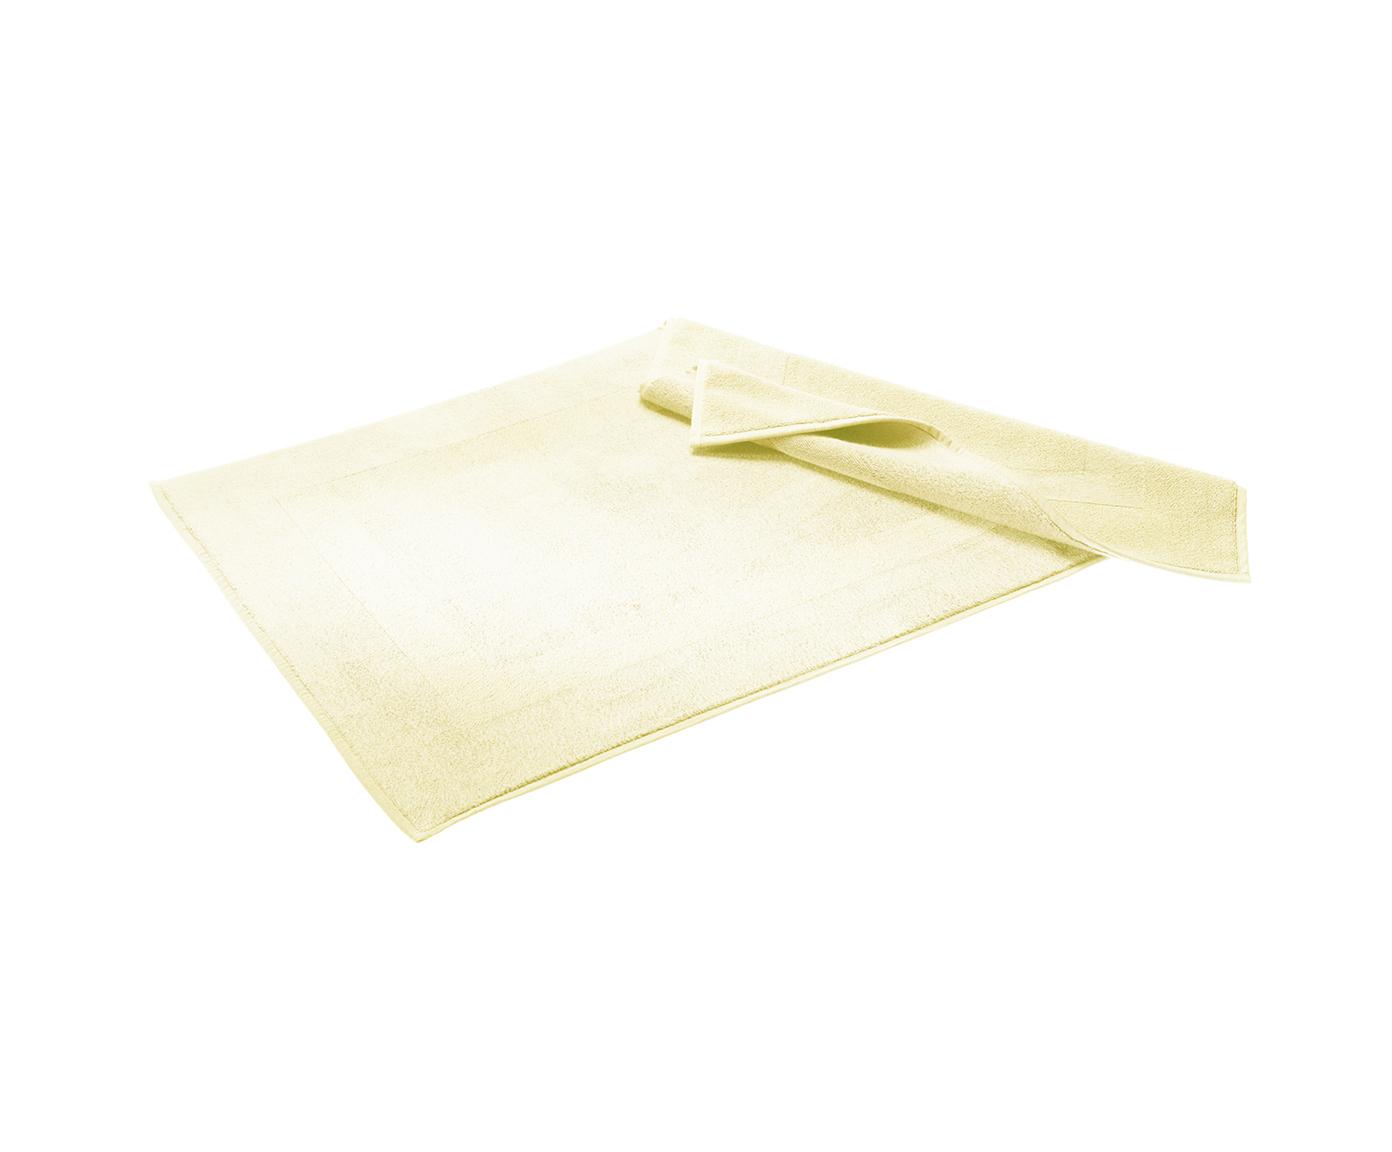 Коврики для ванной Элитный коврик для ванной Waterside слоновая кость от Hamam elitnyy-kovrik-dlya-vannoy-waterside-slonovaya-kost-ot-hamam-turtsiya.jpg